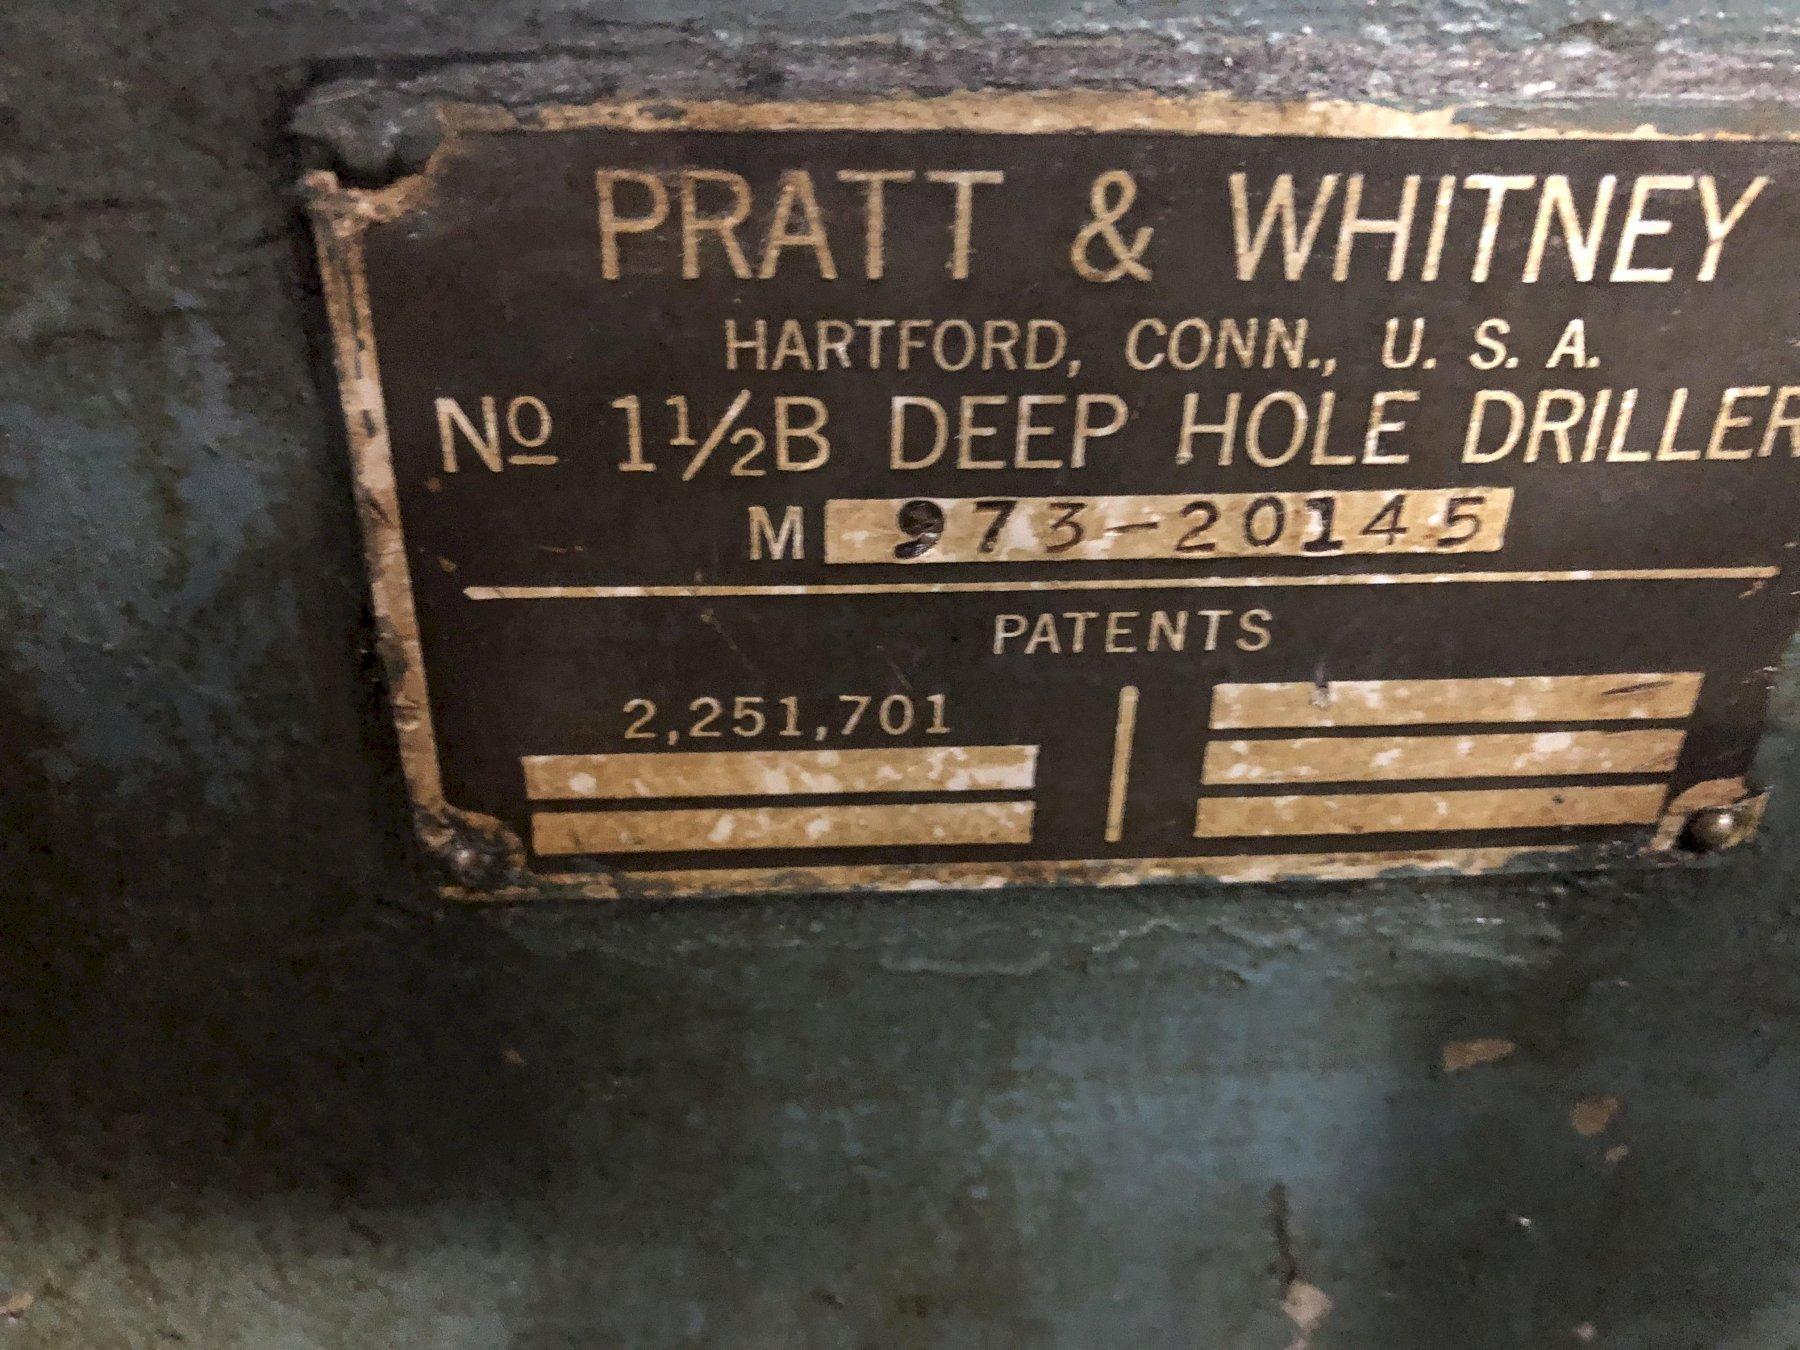 "1 ½B x 81"" Pratt & Whitney Deep Hole Drilling Machine"